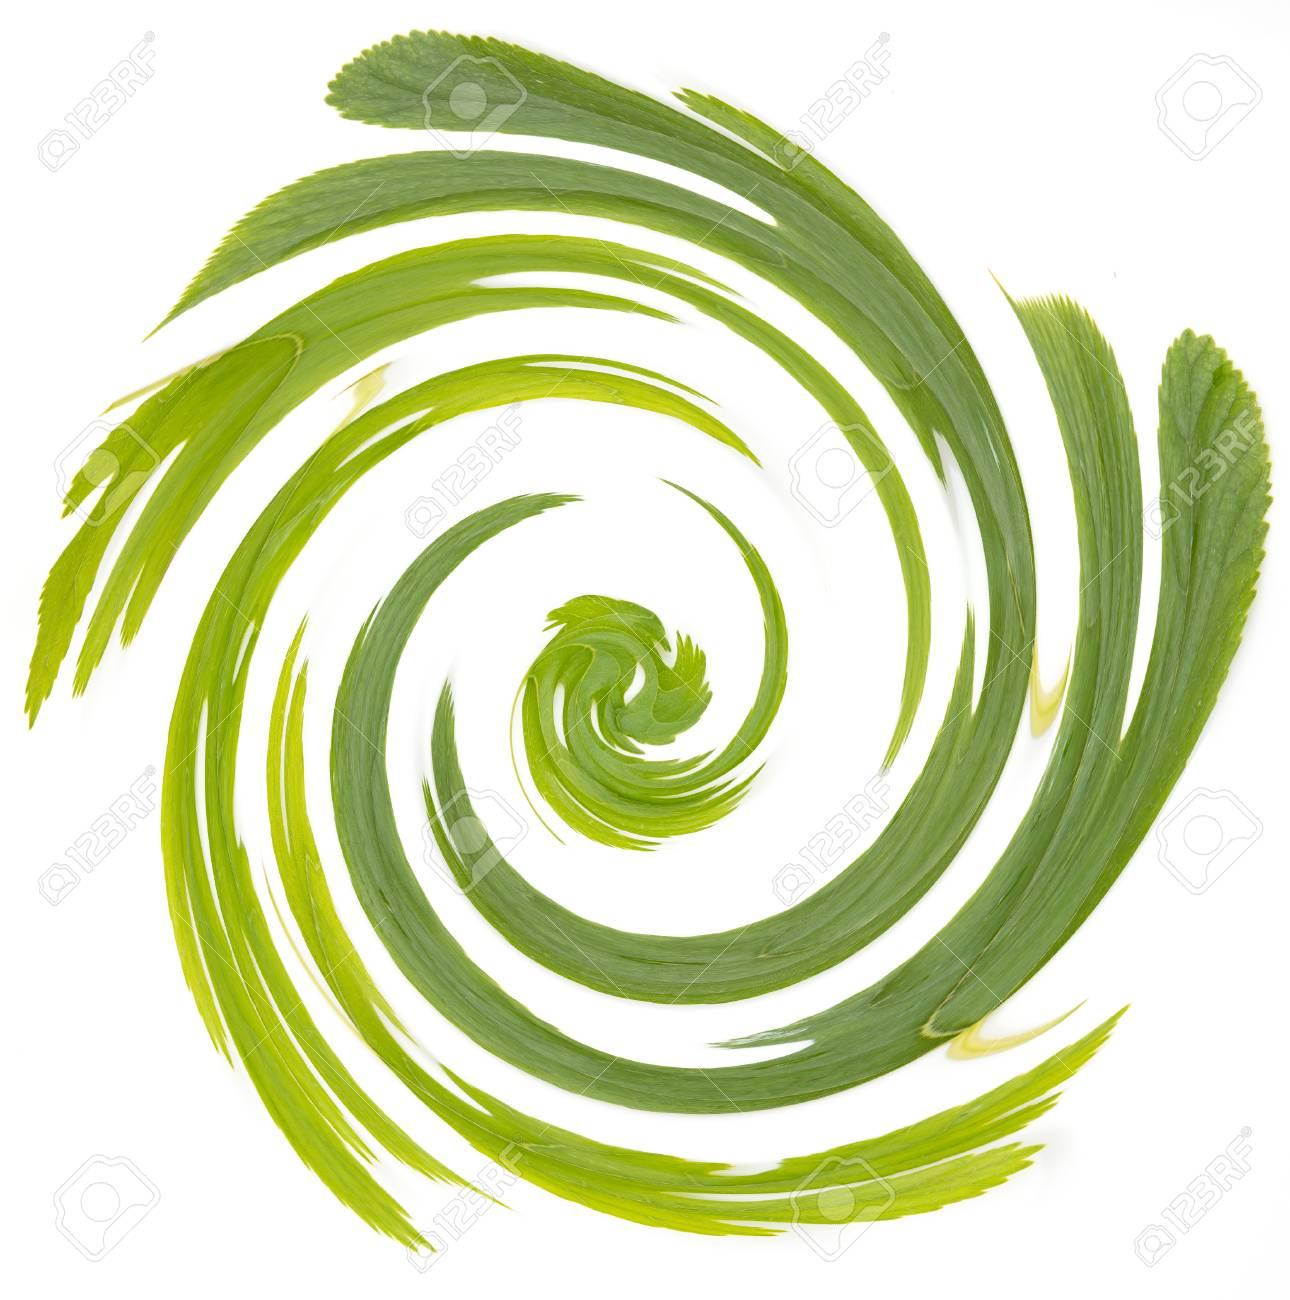 Abstract Sfondo Verde E Bianco